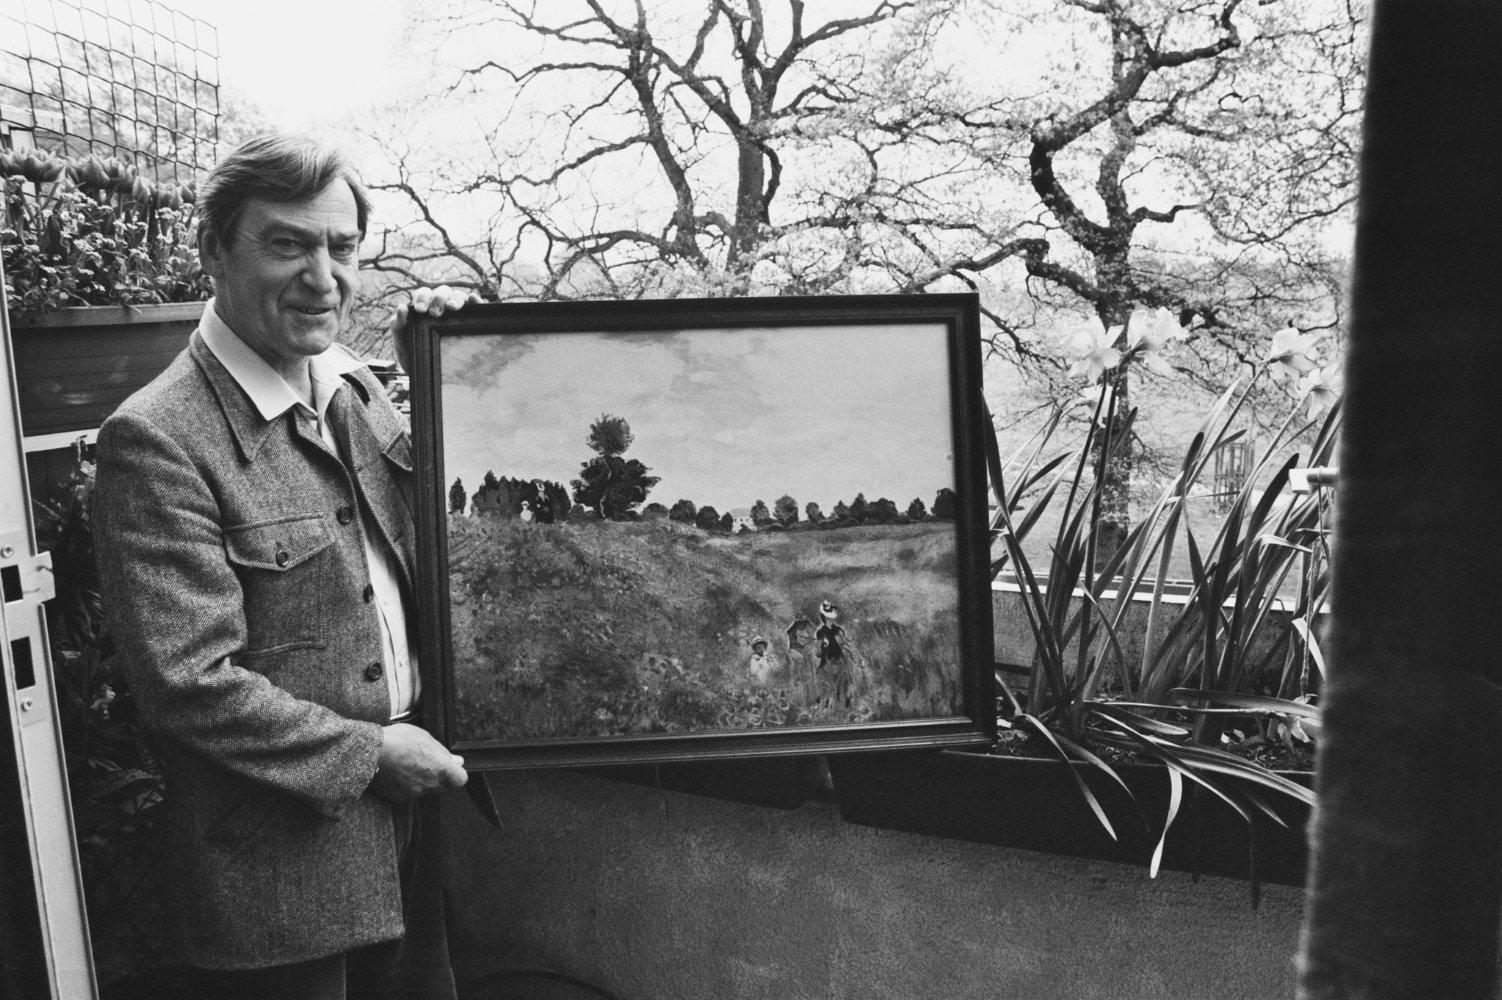 Patrick Troughton